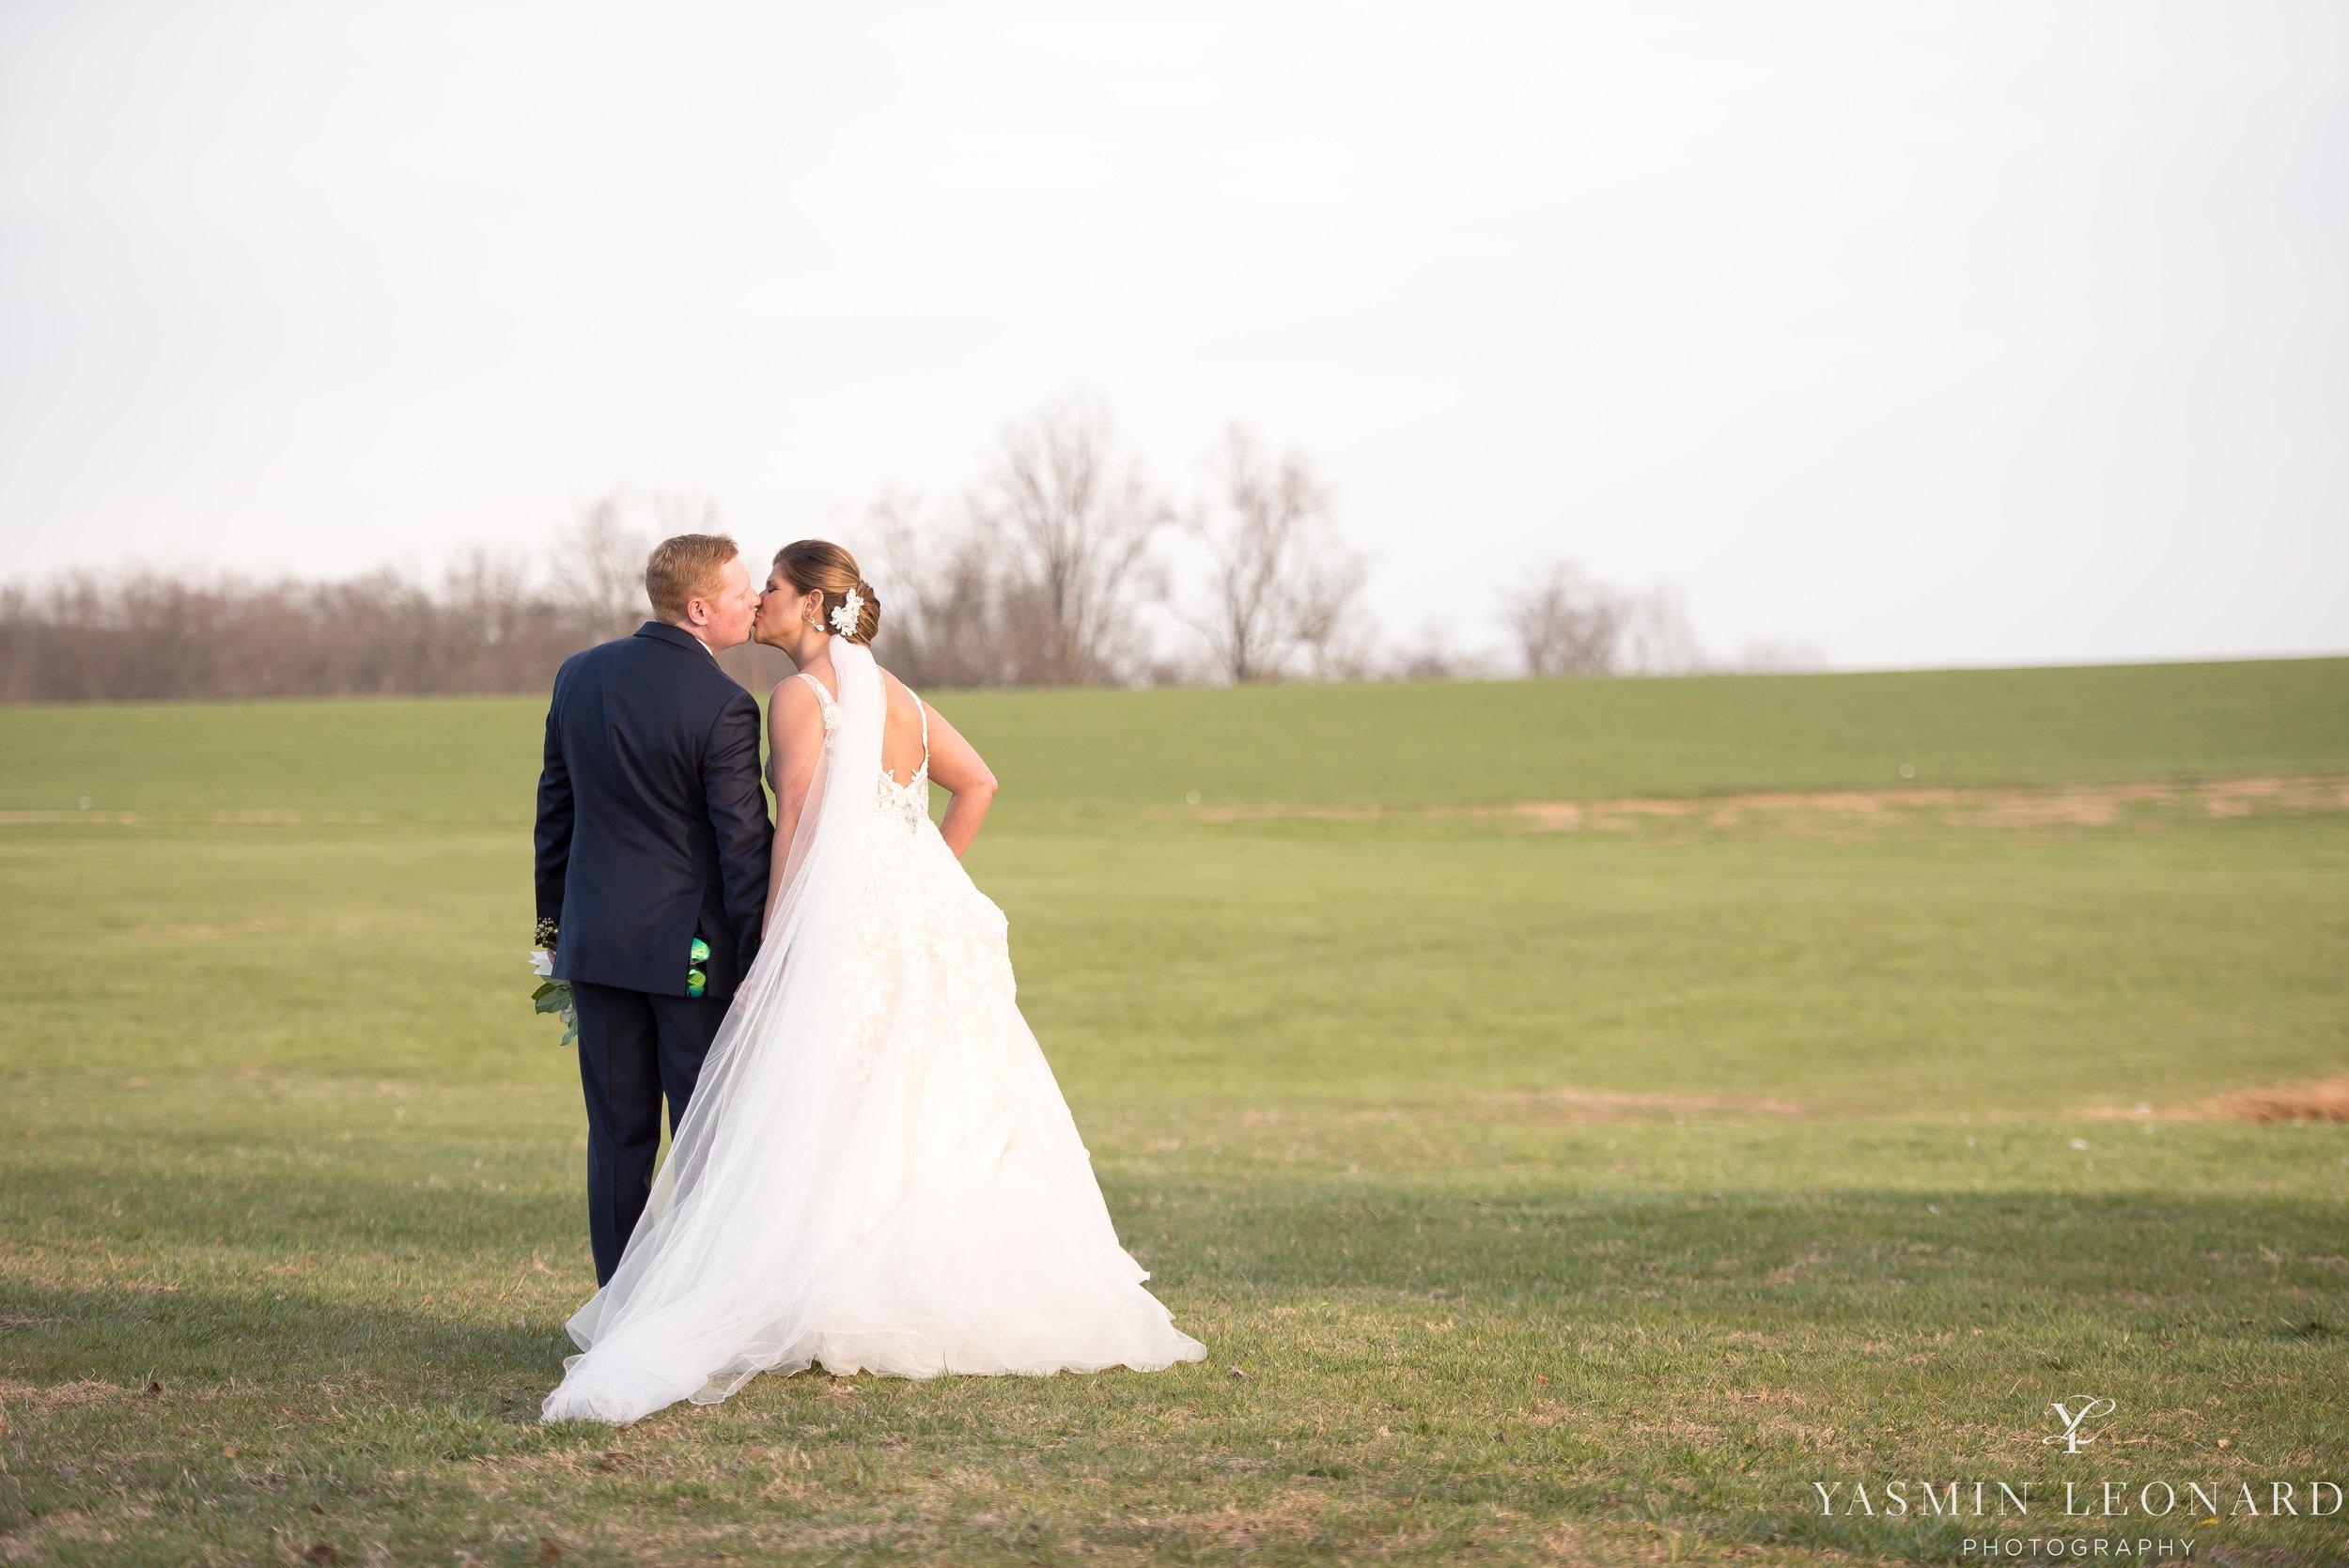 Adaumont Farm - Adaumont Farm Weddings - Trinity Weddings - NC Weddings - Yasmin Leonard Photography-42.jpg